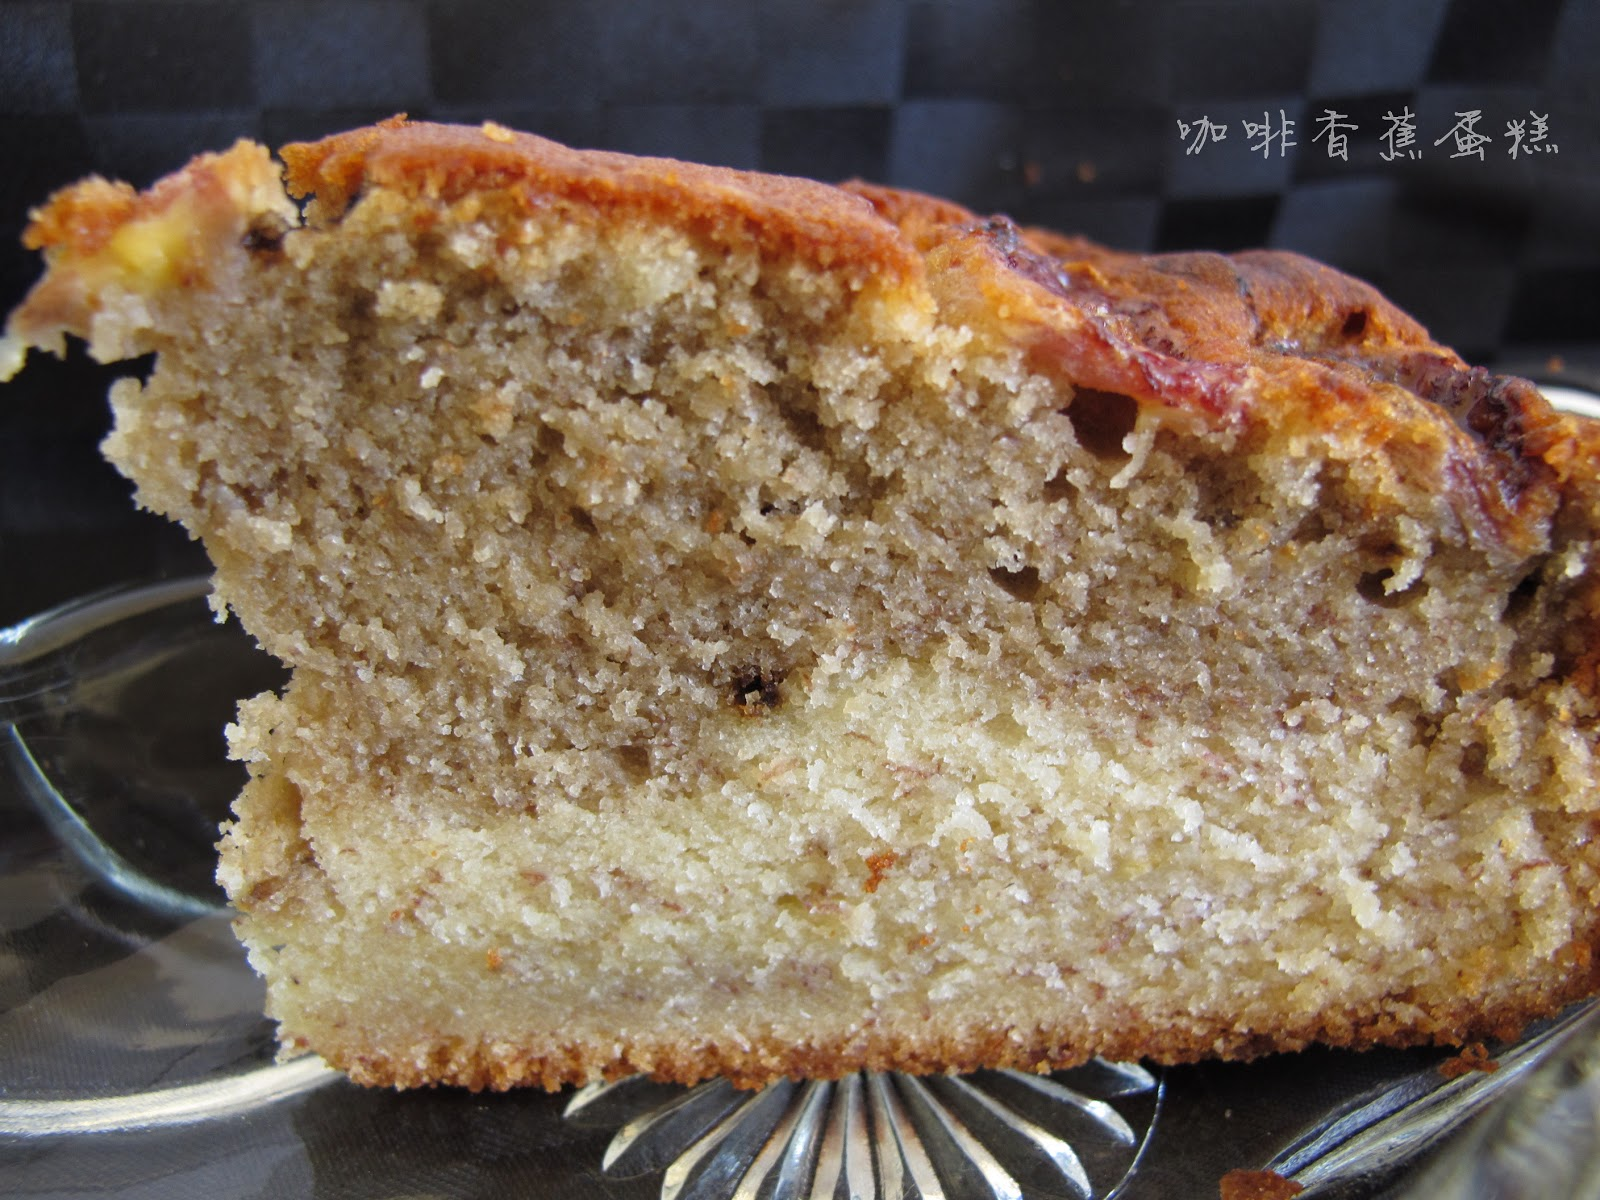 Angeline Kitchen: 咖啡香蕉磅蛋糕~Coffee Banana Cake